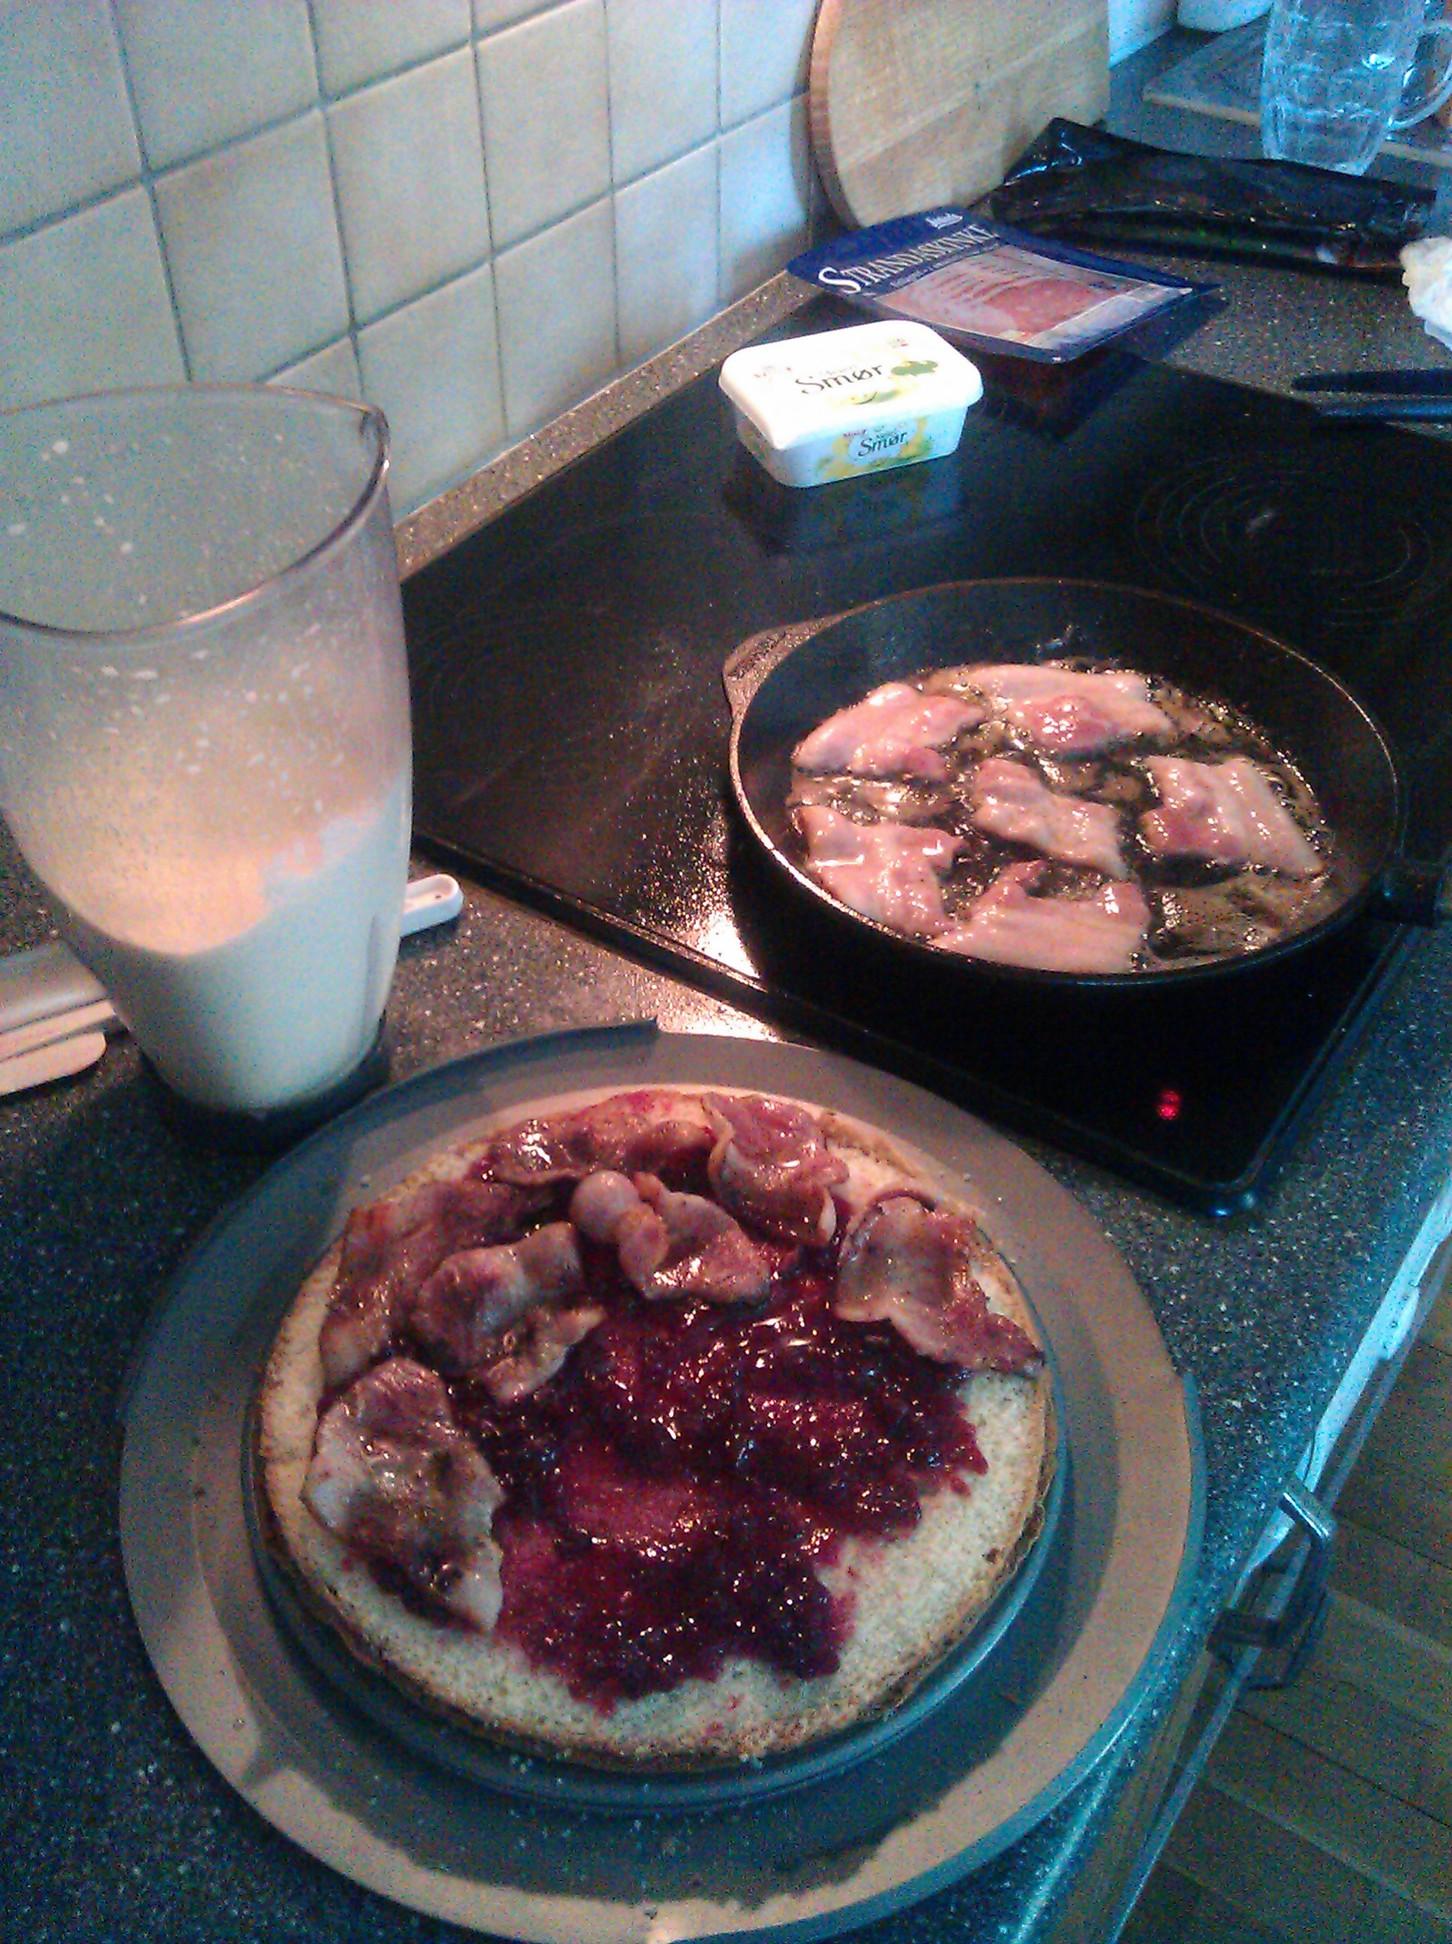 Cake layer 1, lingonberries jam and fried ham